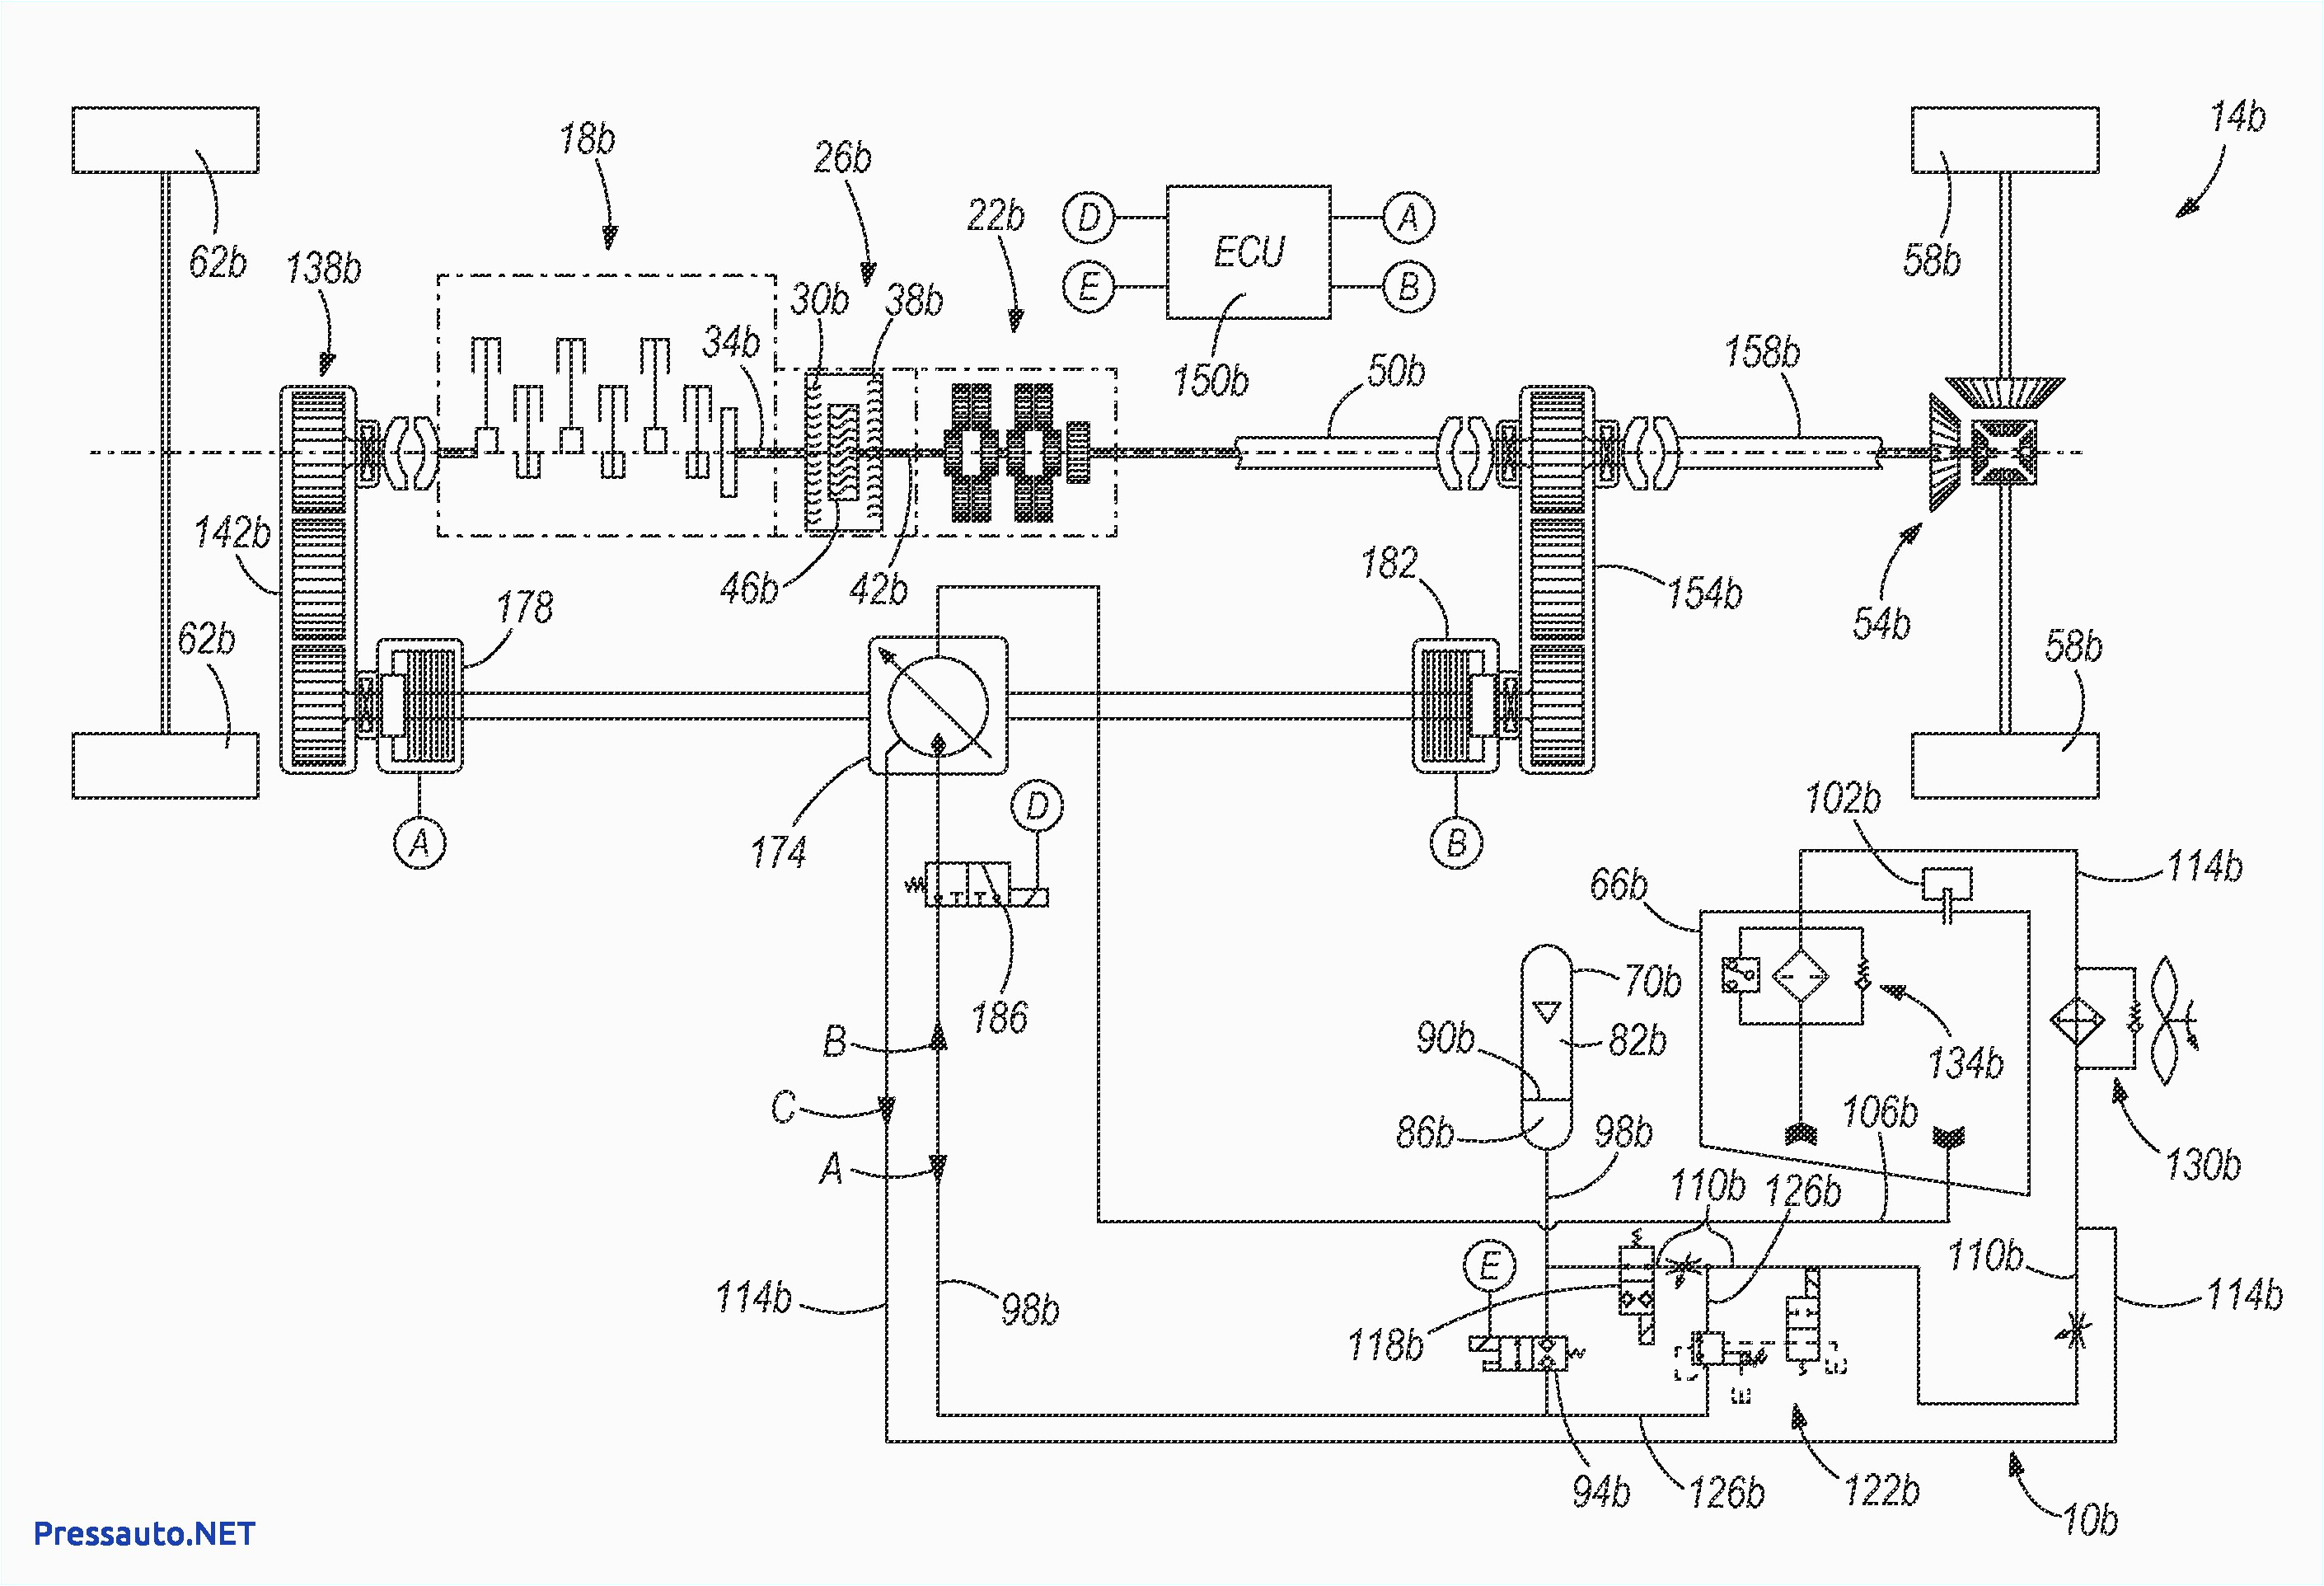 fleetwood bounder motorhome wiring diagram wiring diagram host 1999 fleetwood bounder wiring diagram 1999 bounder wiring diagram